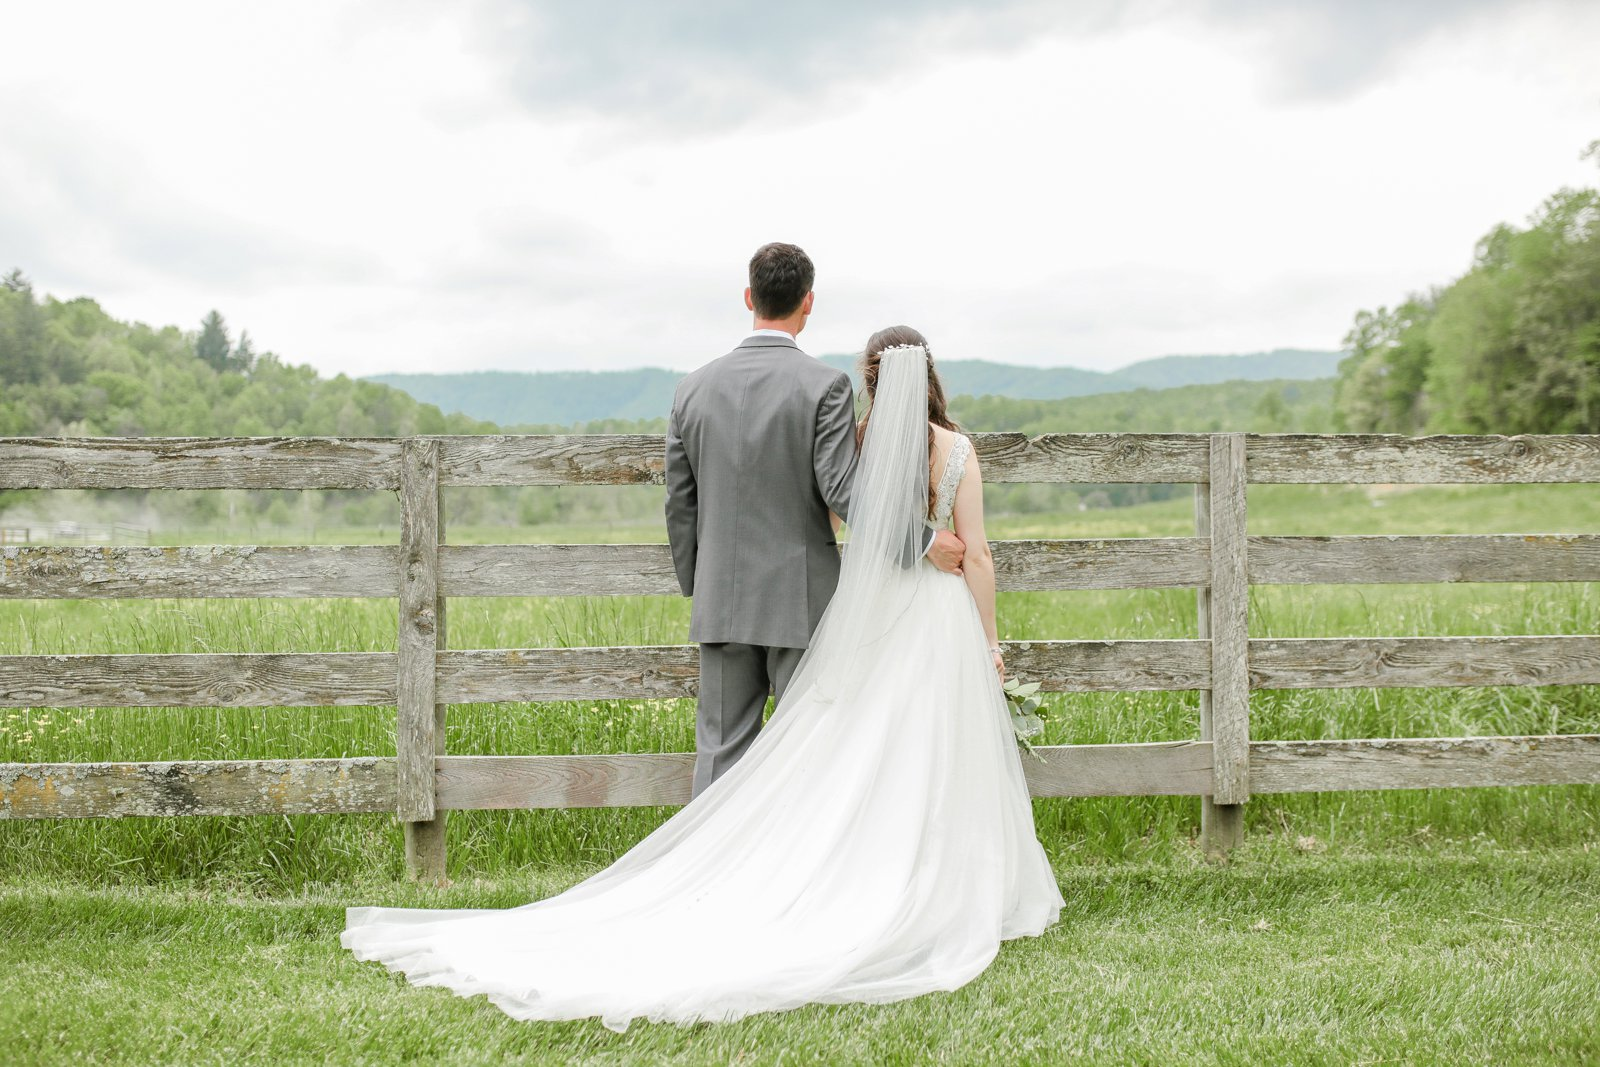 wedding_photographer_Missouri_Destination_elope_intimate_Saint_James_MO_Missouri_KansasCity_Jeff_City_Jefferson_Columbia_Engagement_Photos_Pictures_Session_Best_Videographer_0195.jpg